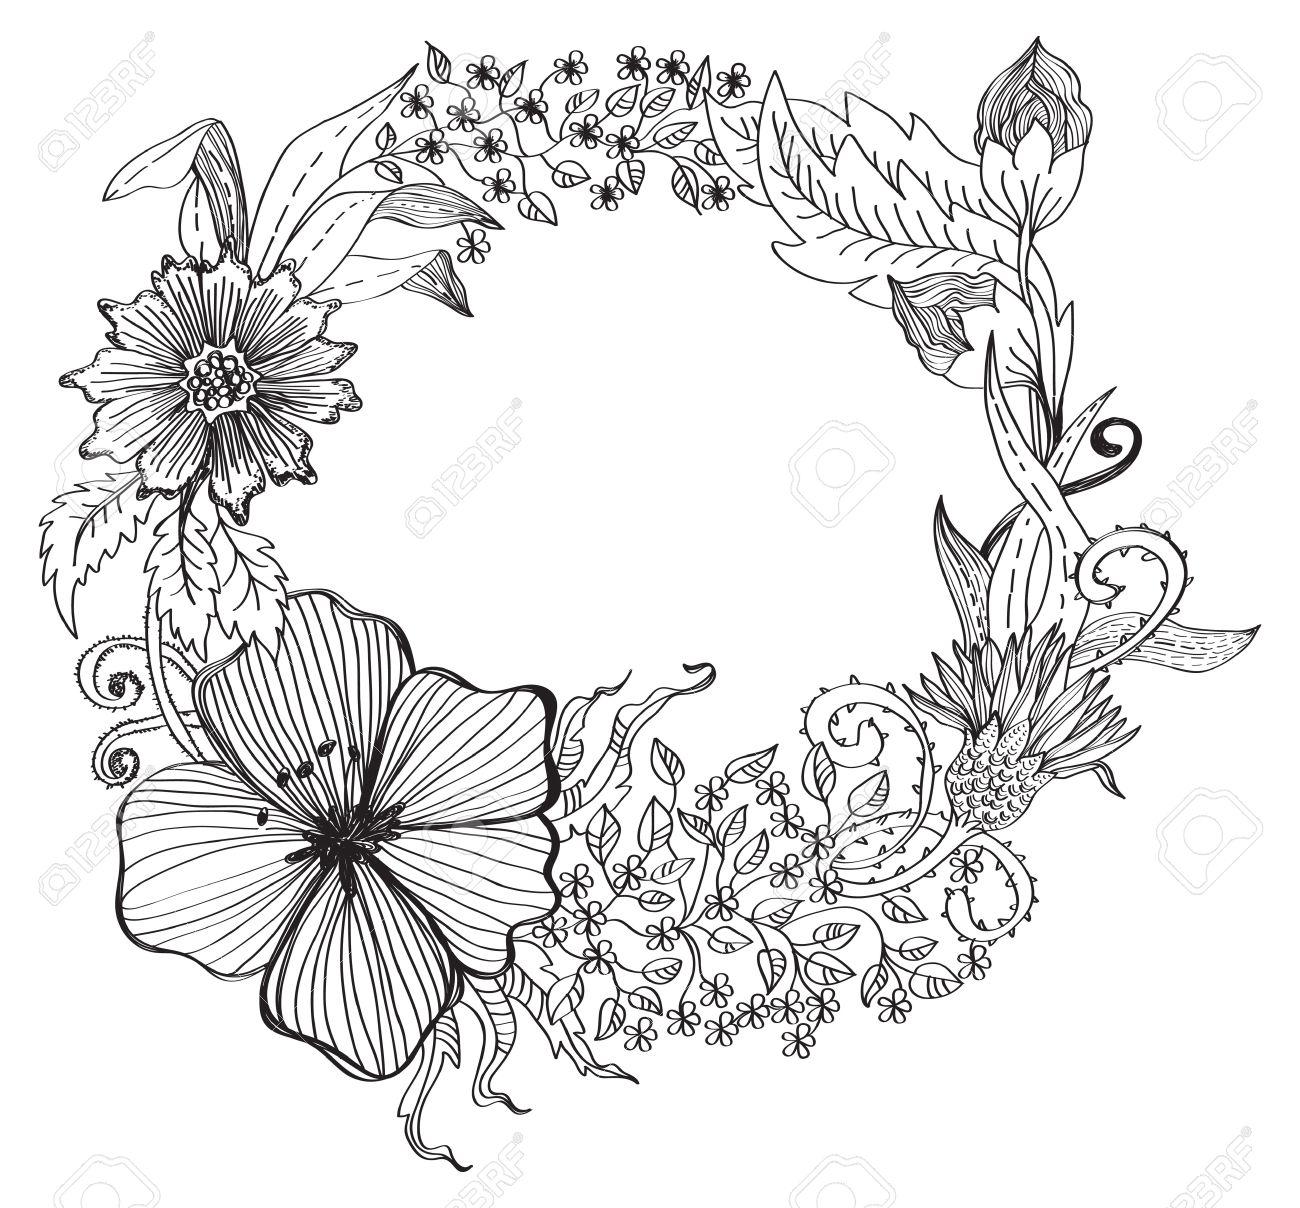 Romantic Flower Background For Design Hand Drawing Illustration